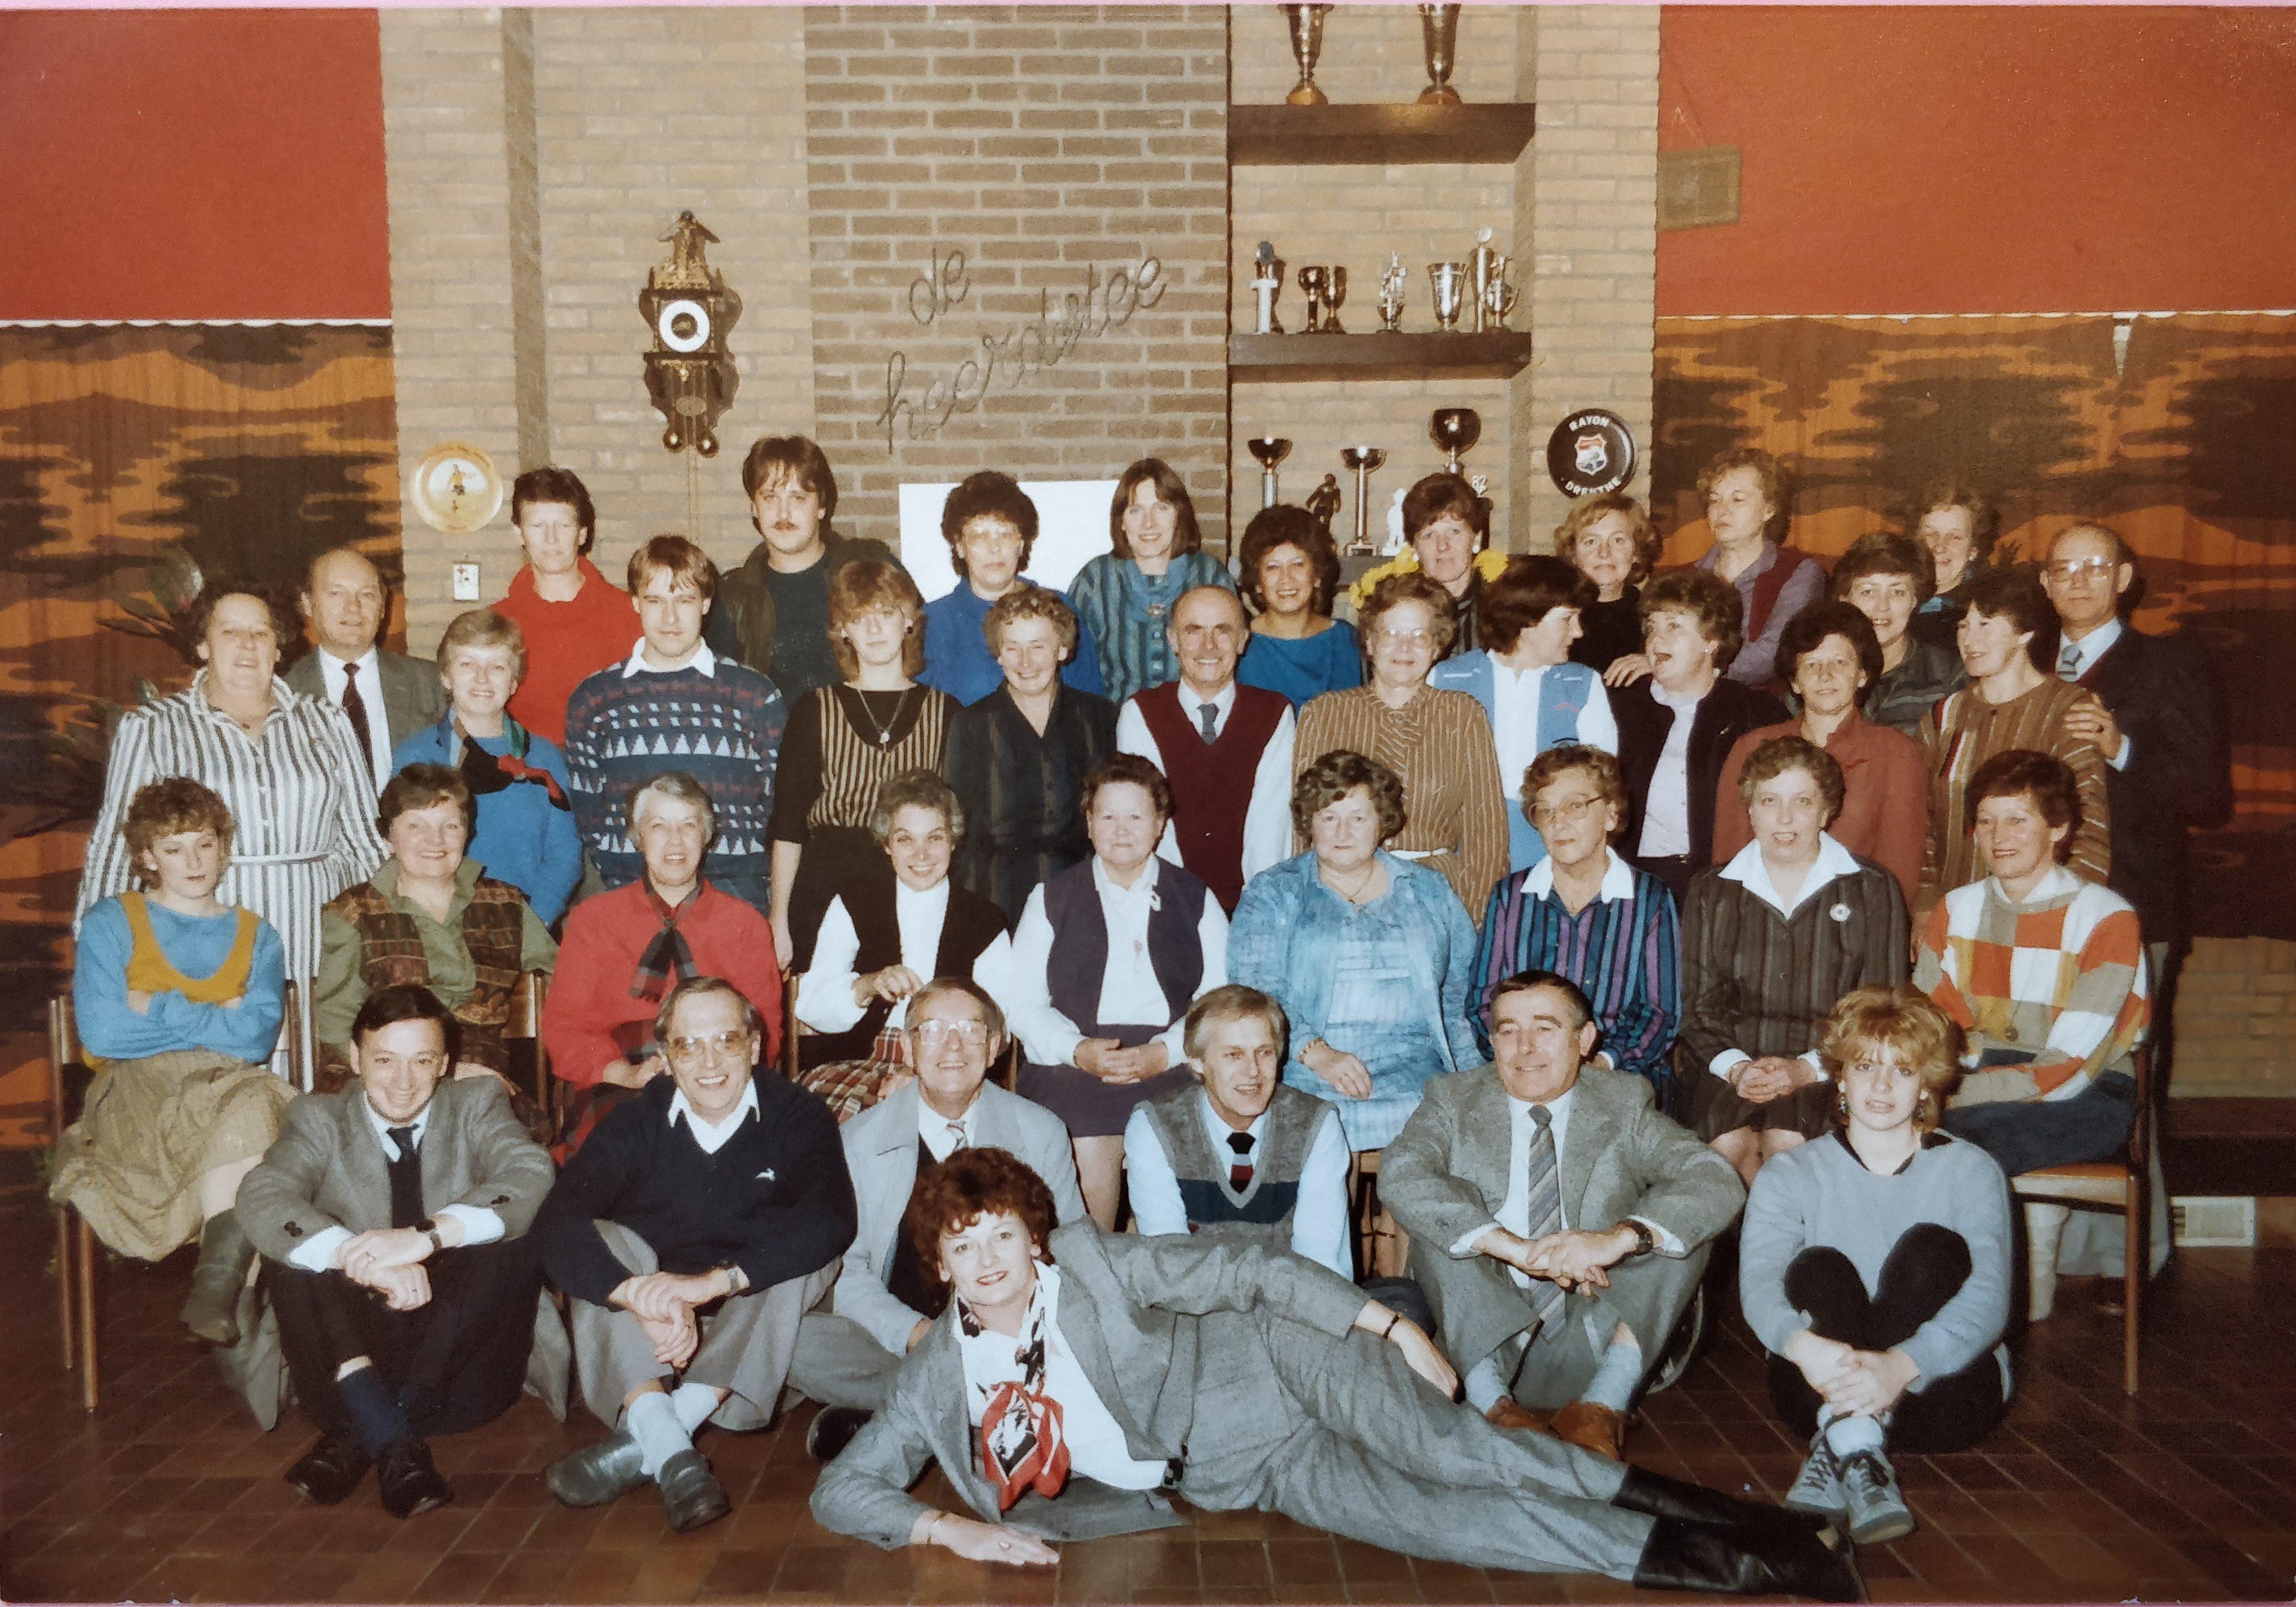 Kantinevrijwilligers Achilles1894-1984